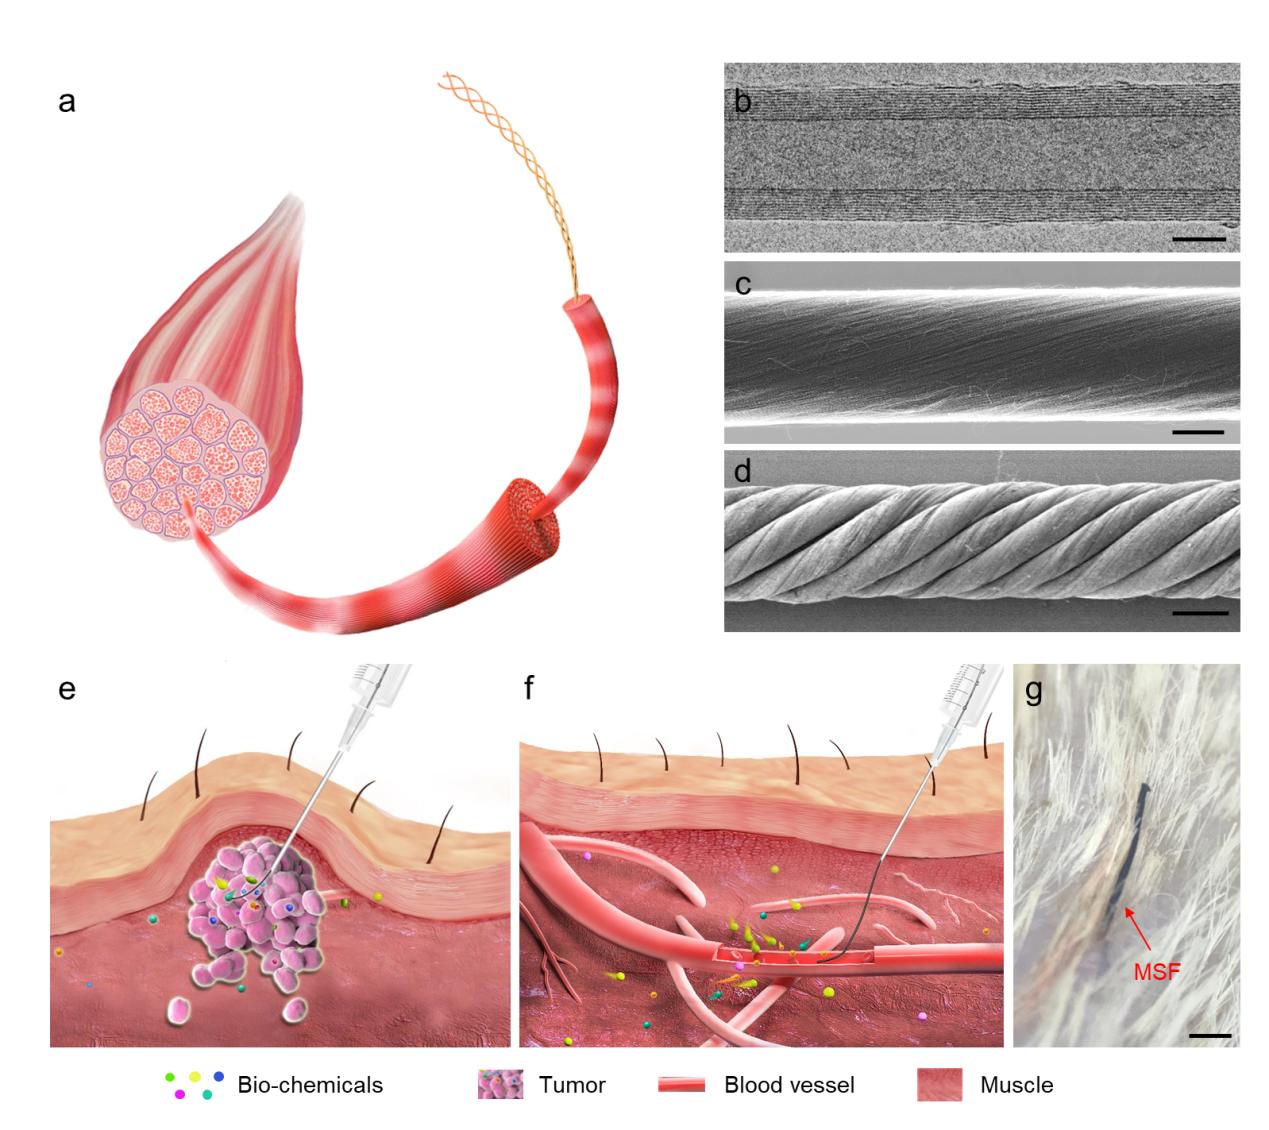 Functionalized helical fibre bundles of carbon nanotubes for